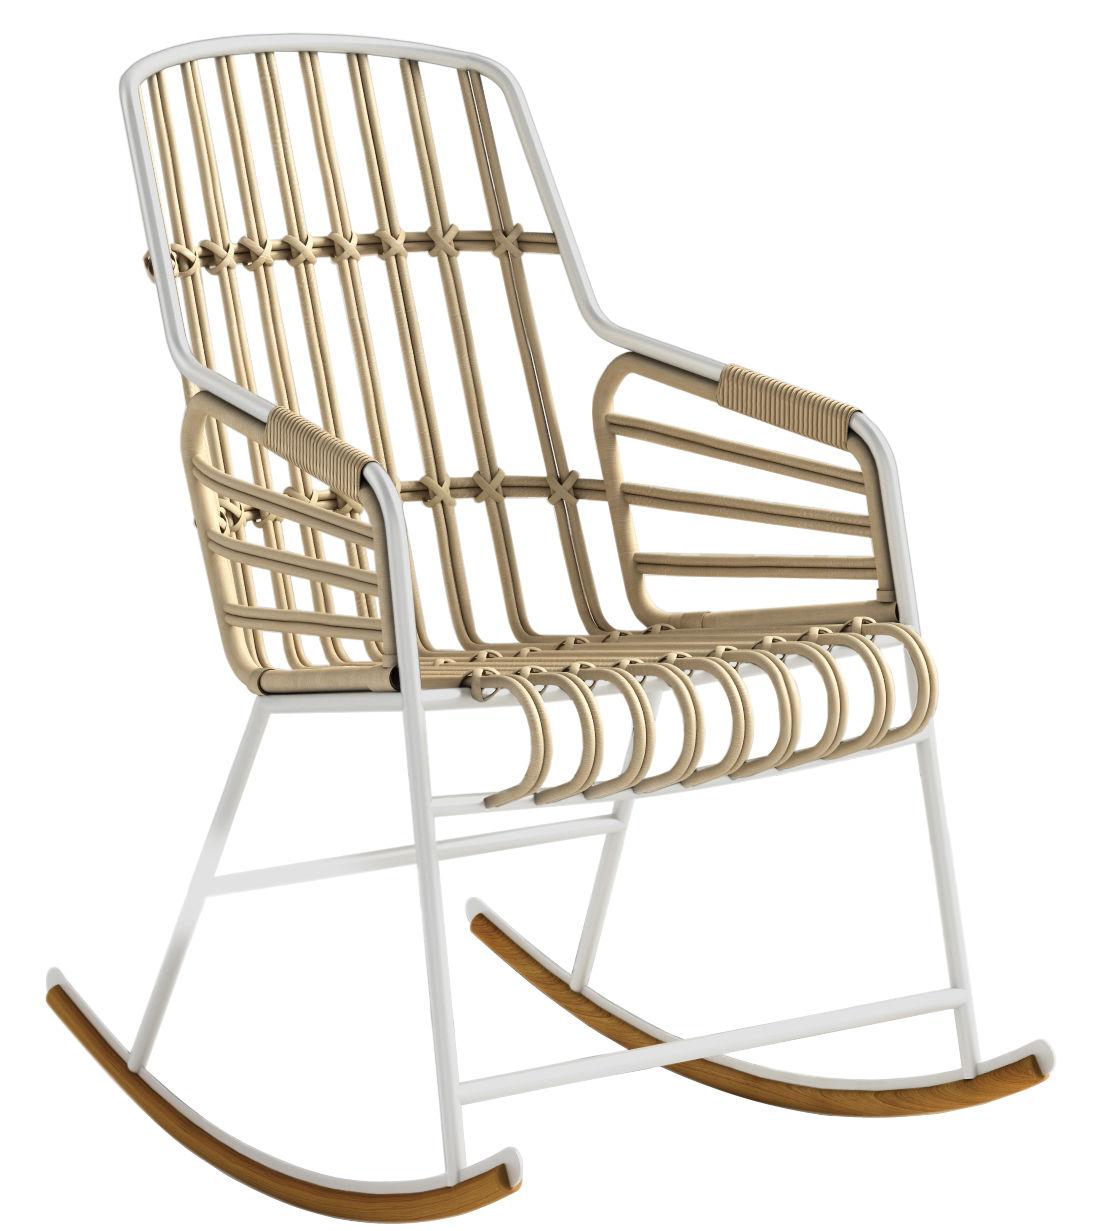 Möbel - Lounge Sessel - Raphia Schaukelstuhl - Casamania - Weiß - Jonc, lackiertes Metall